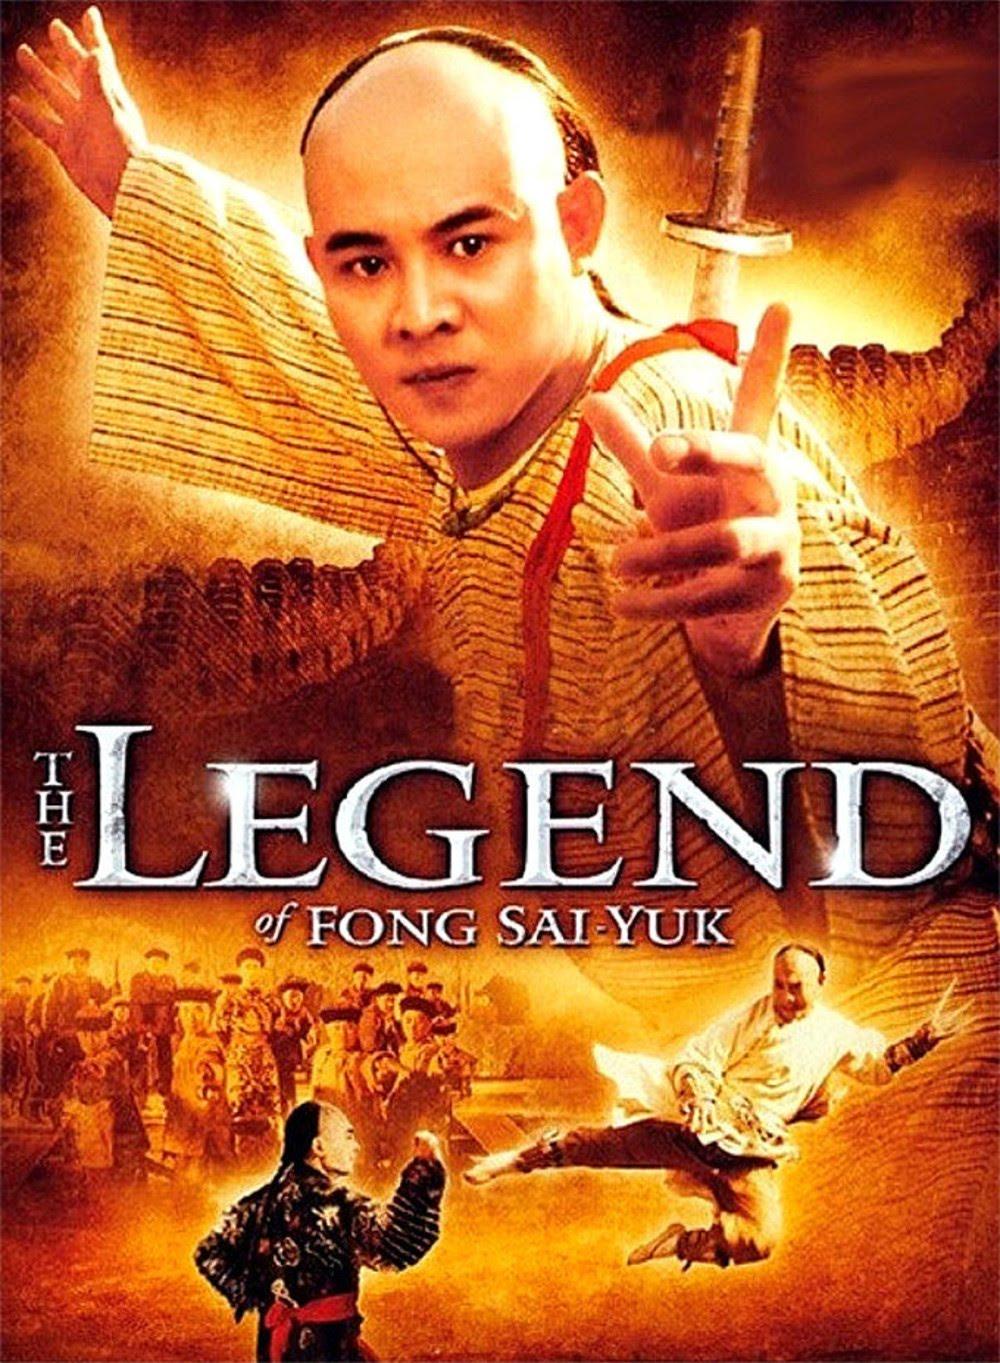 The Legend of Fong Sai-Yuk (1993) ฟงไสหยก สู้บนหัวคน